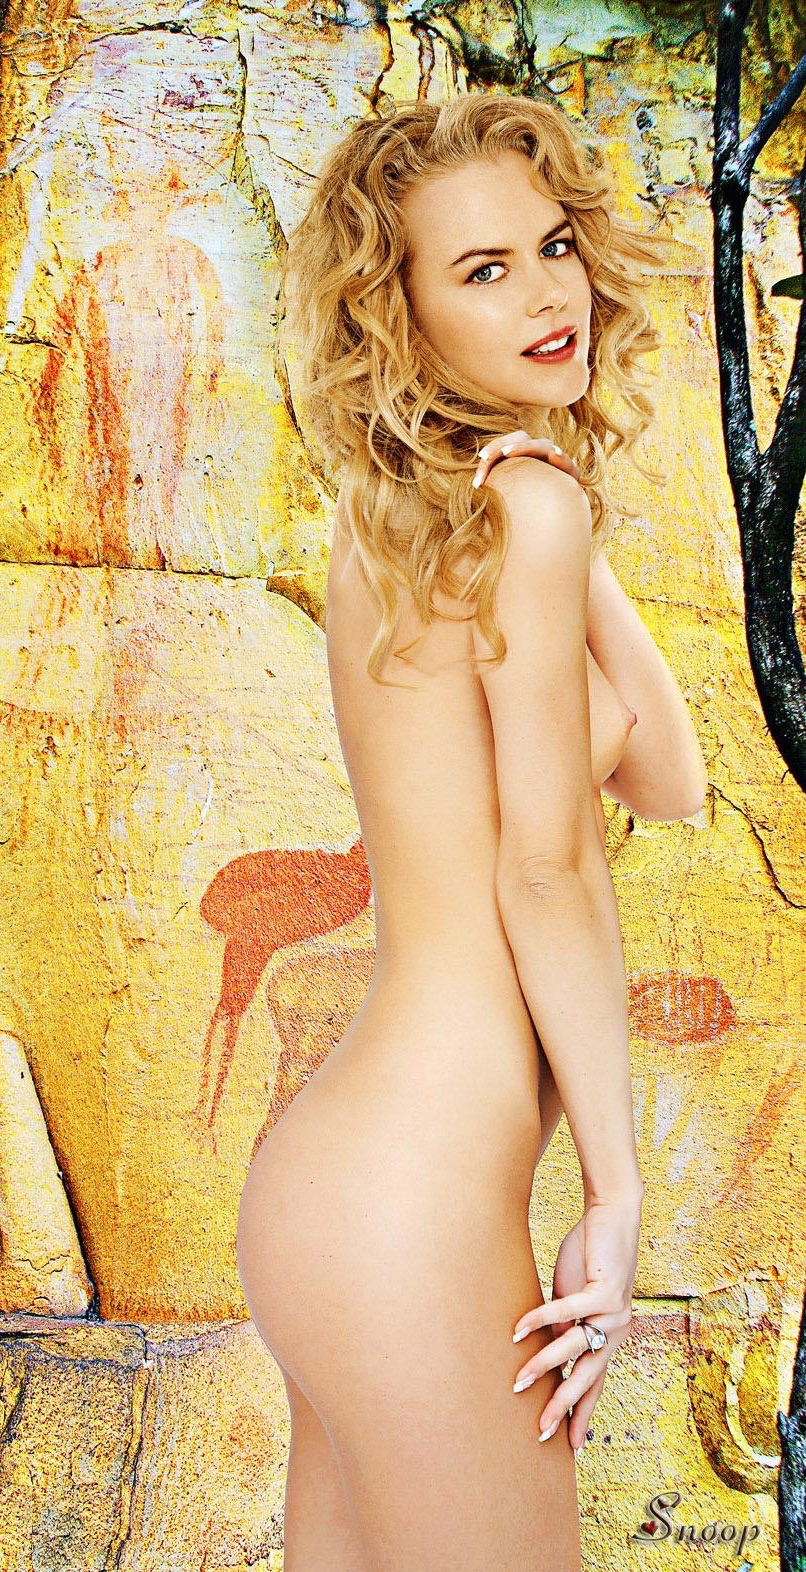 Elizabeth montgomery nude pictures-7401